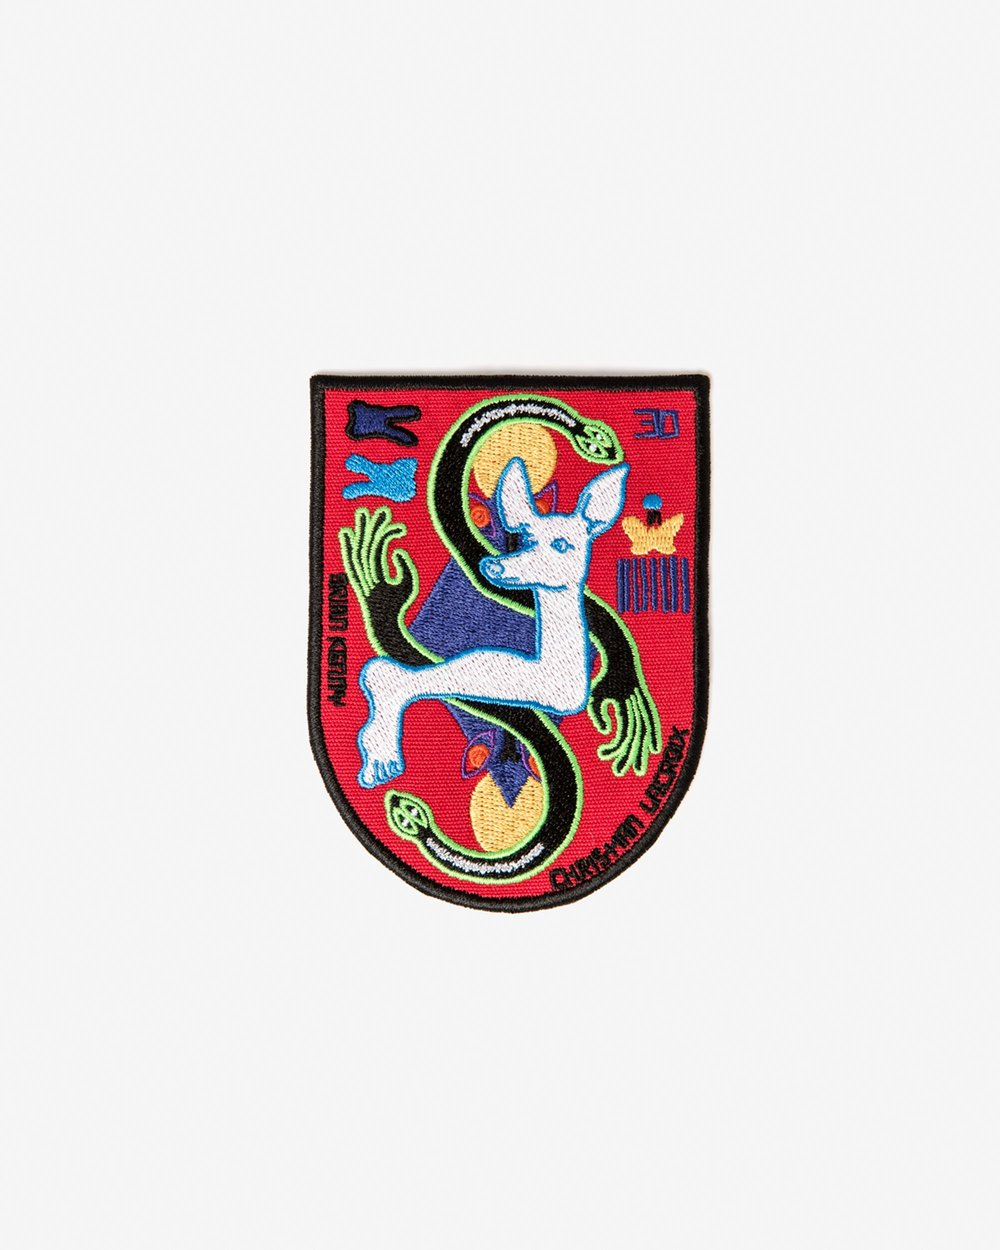 Lacroix_30_ans_CL_x_BK_Badge_Coat_of_arms_red_5a01dff14cc31.jpg